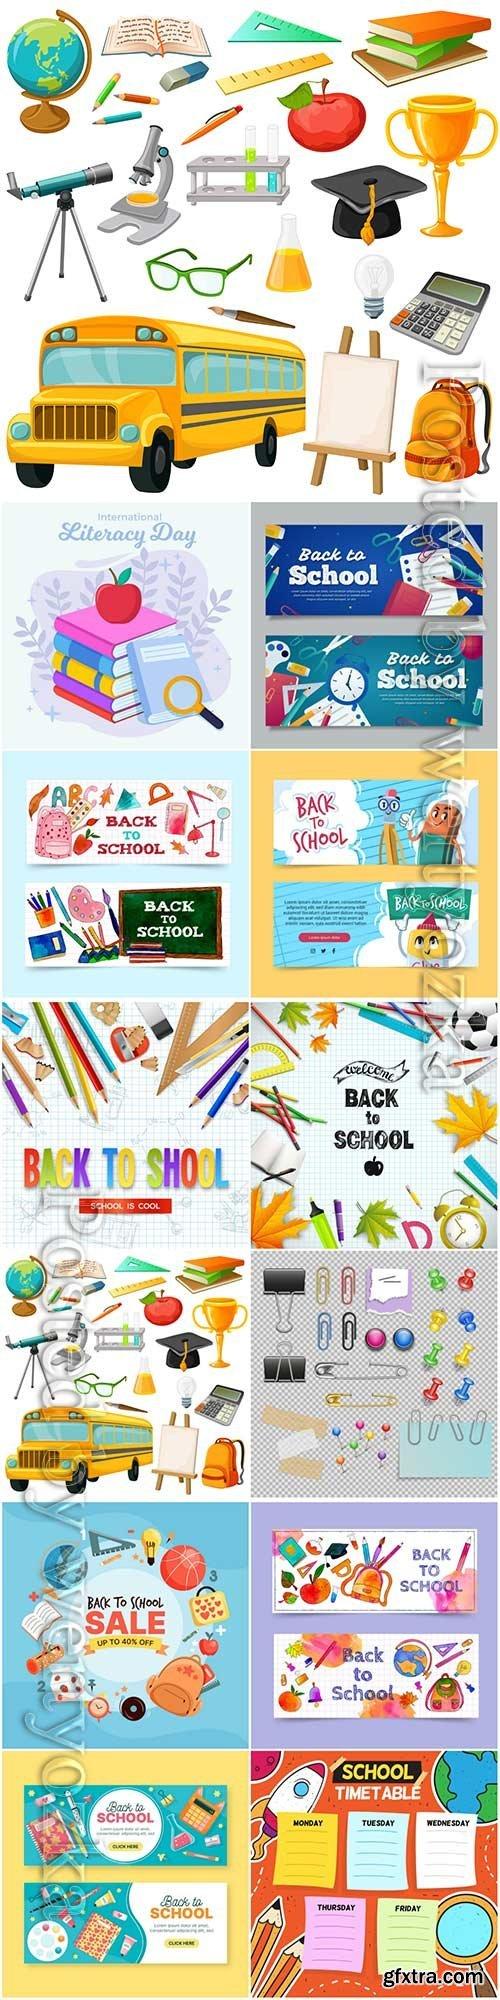 School set and stationery vector illustration